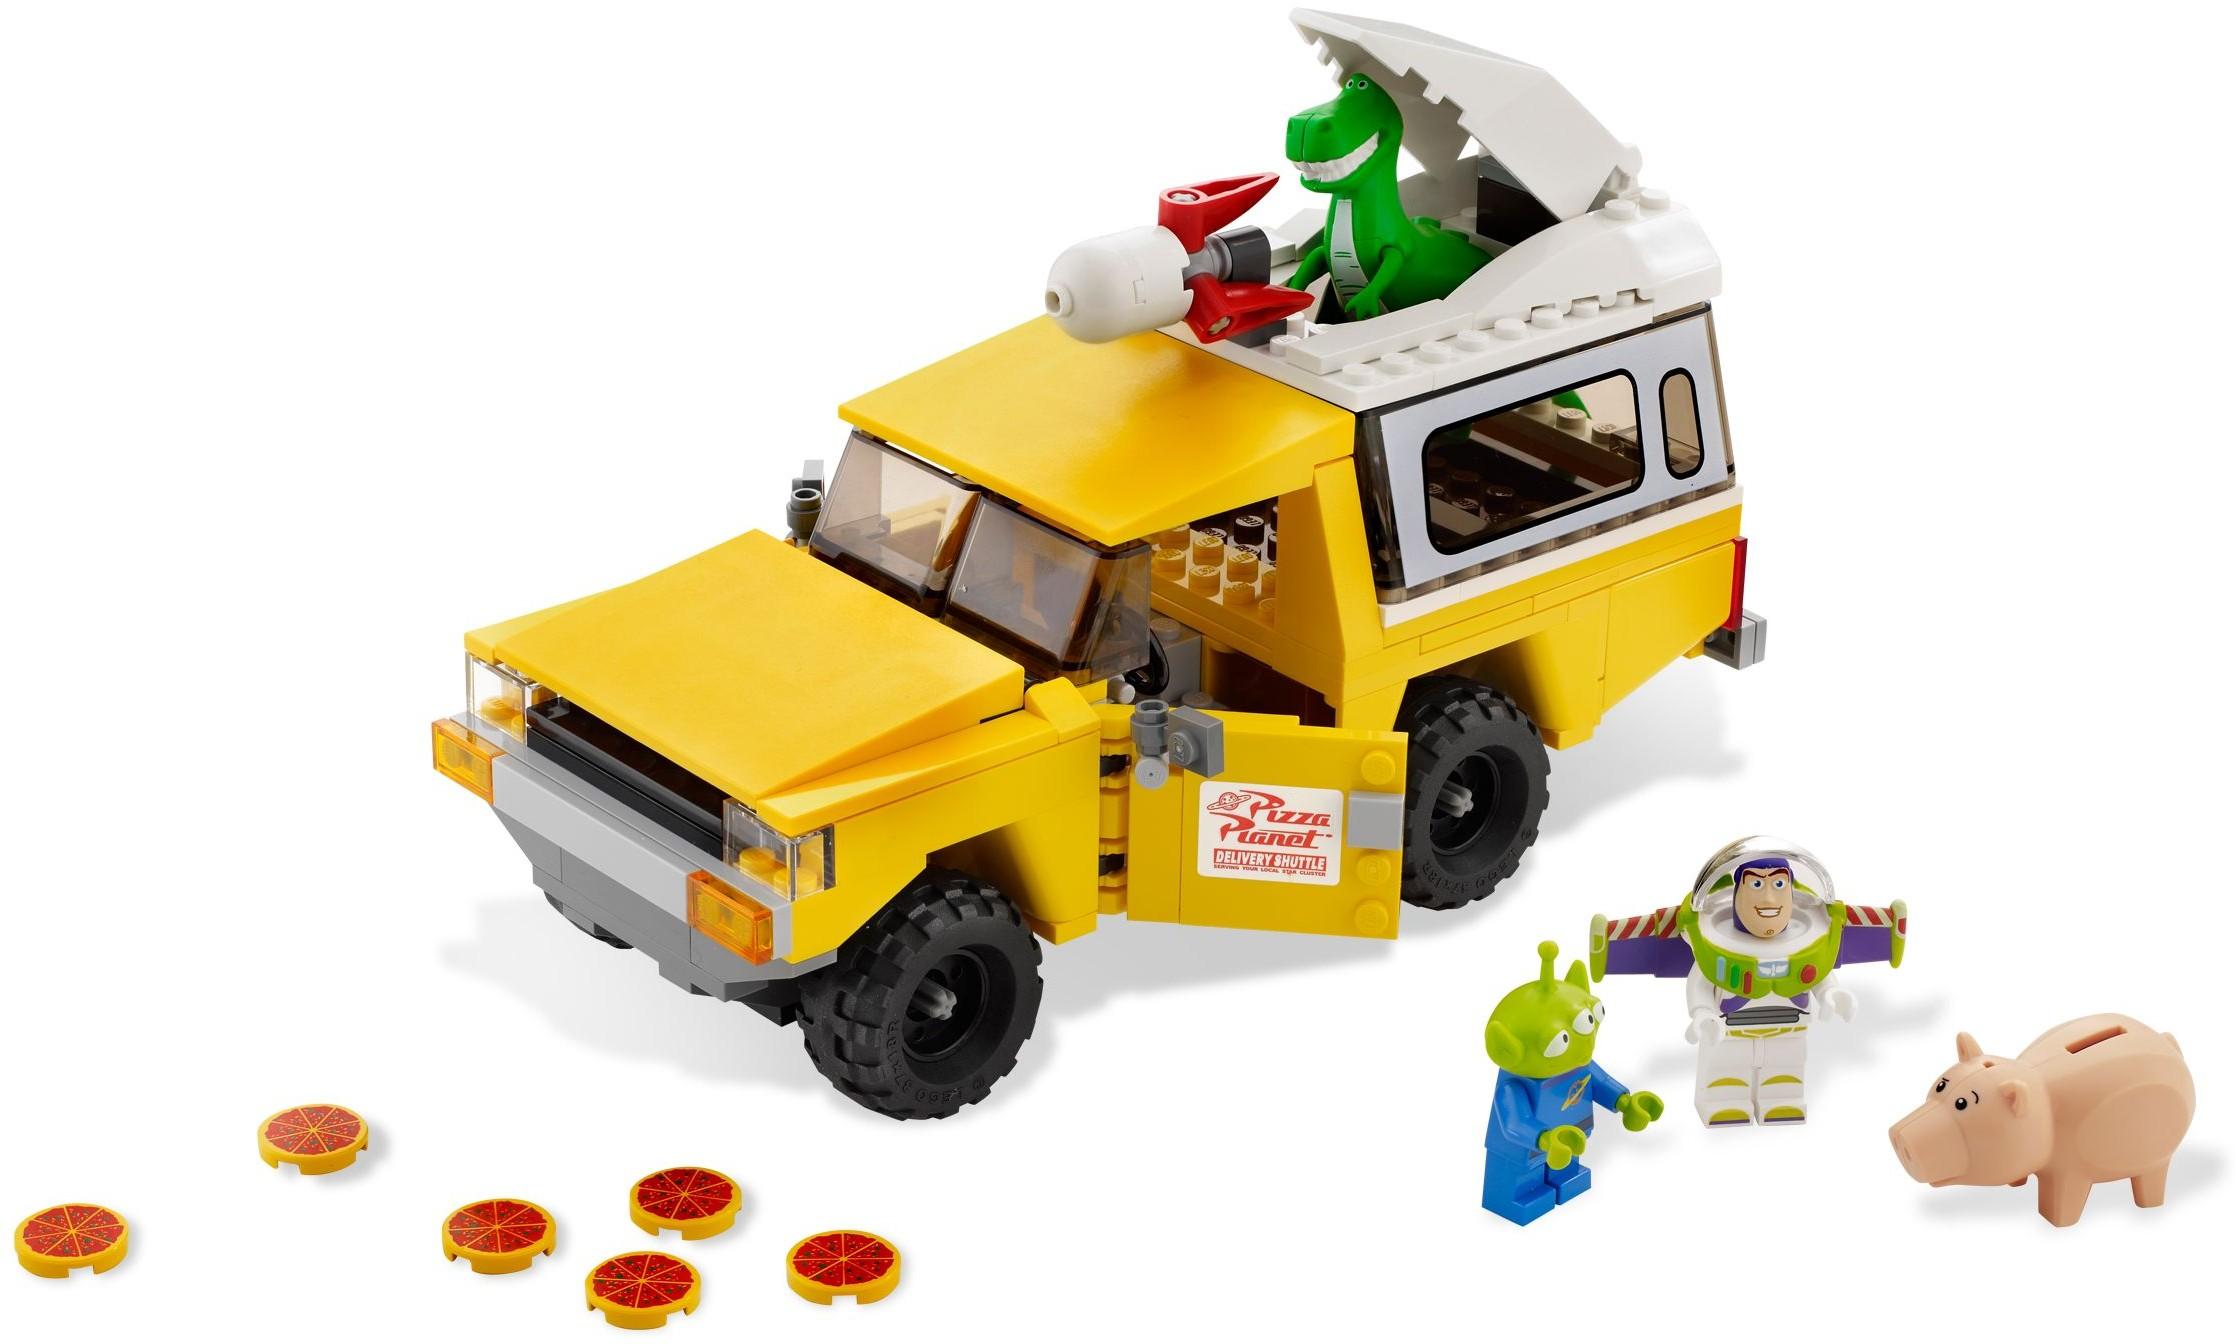 LEGO Disney Rex Toy Story Dinosaur Minifigure Figure From Sets 7597 7598